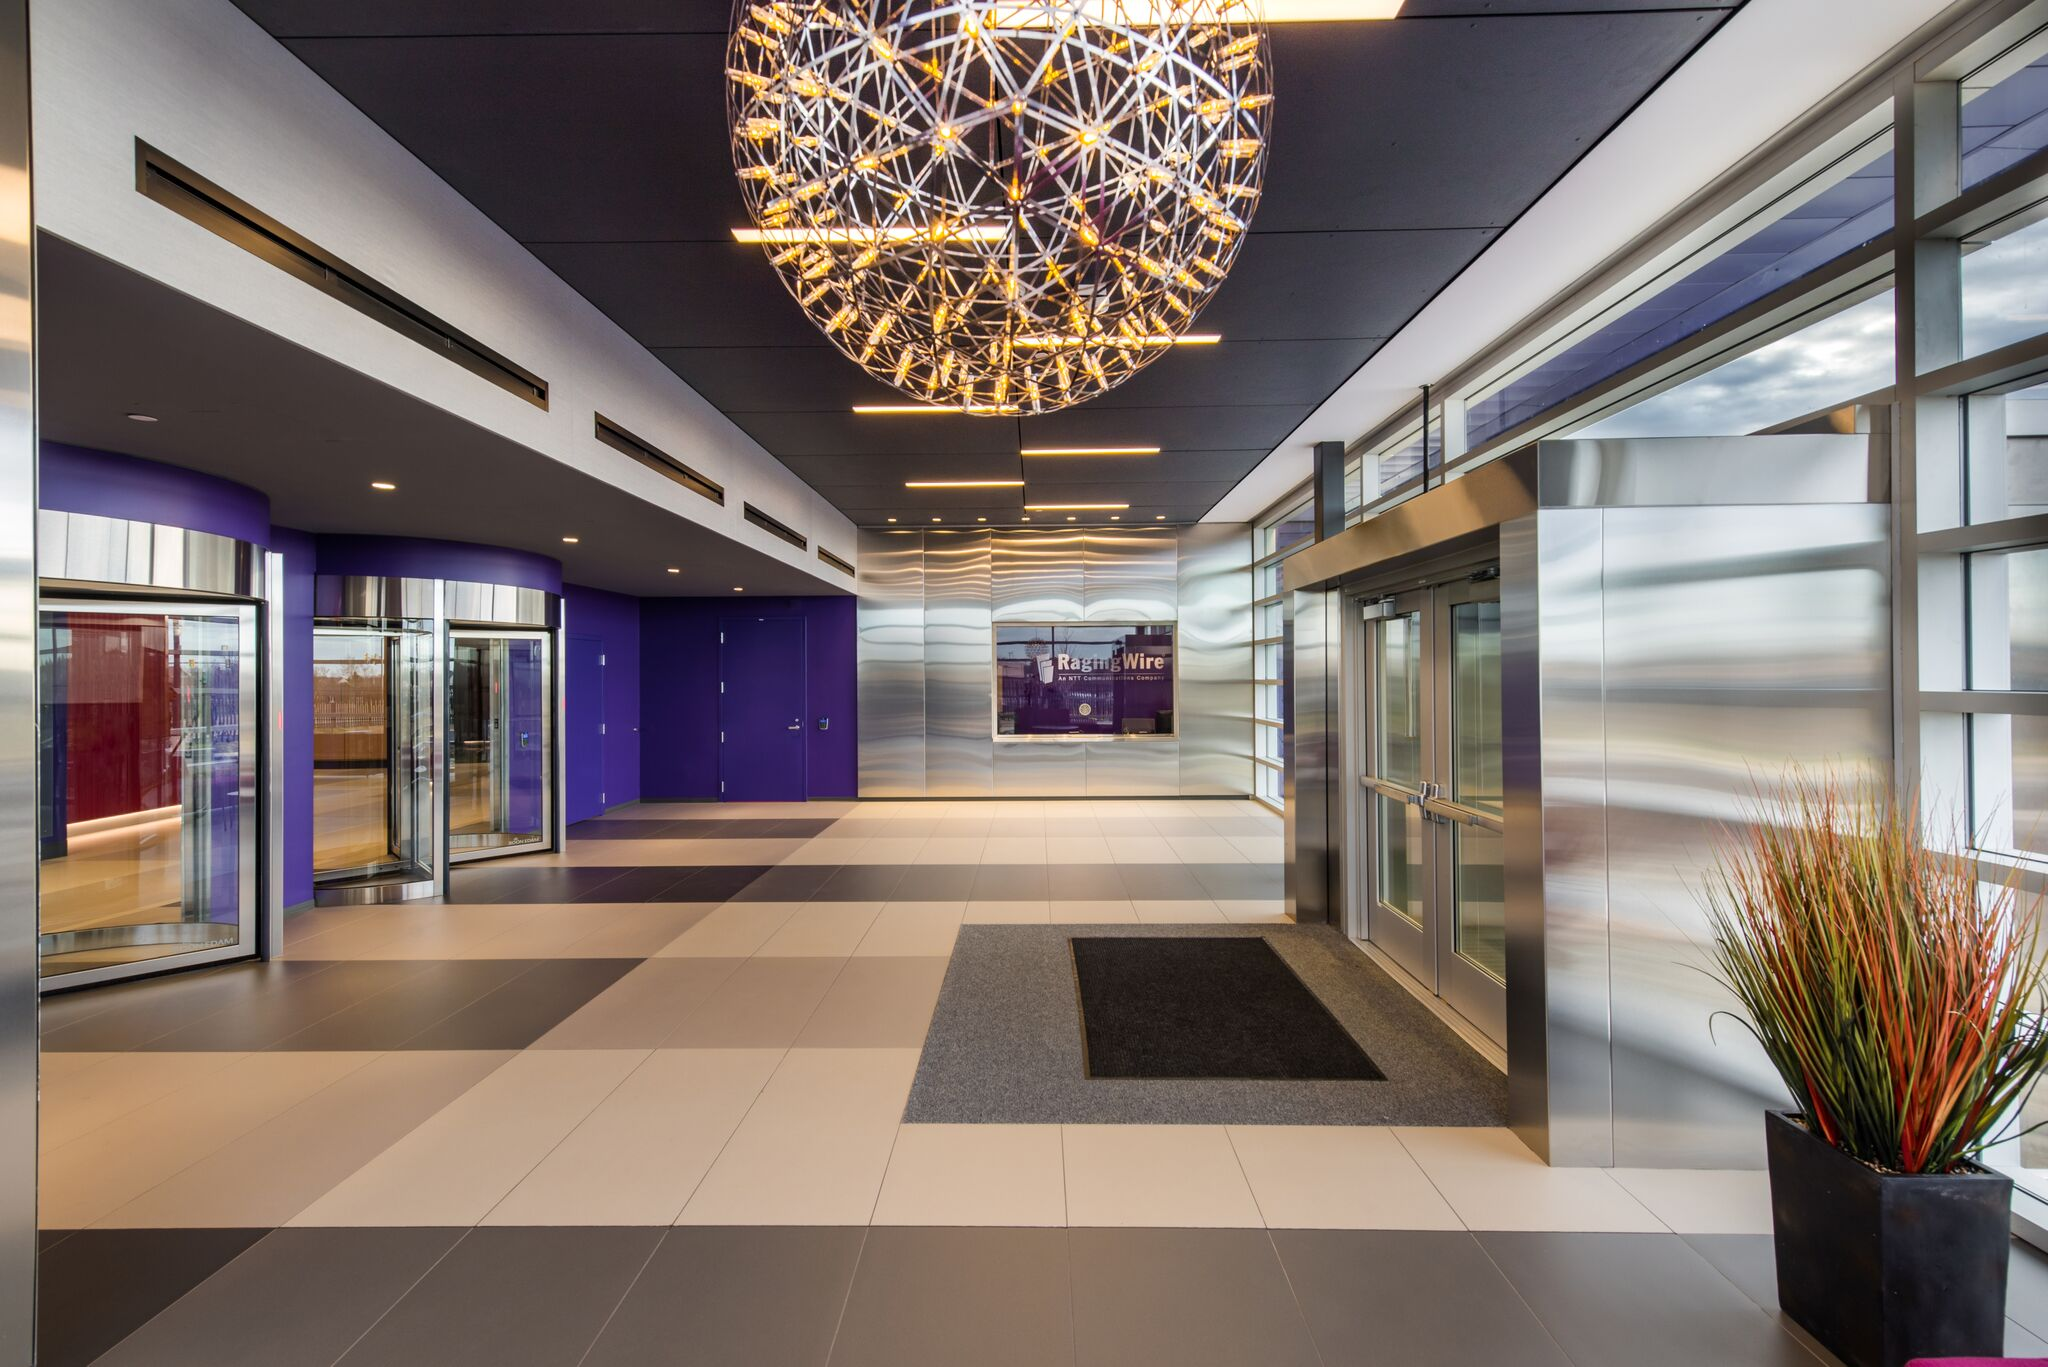 View inside data center entrance lobby